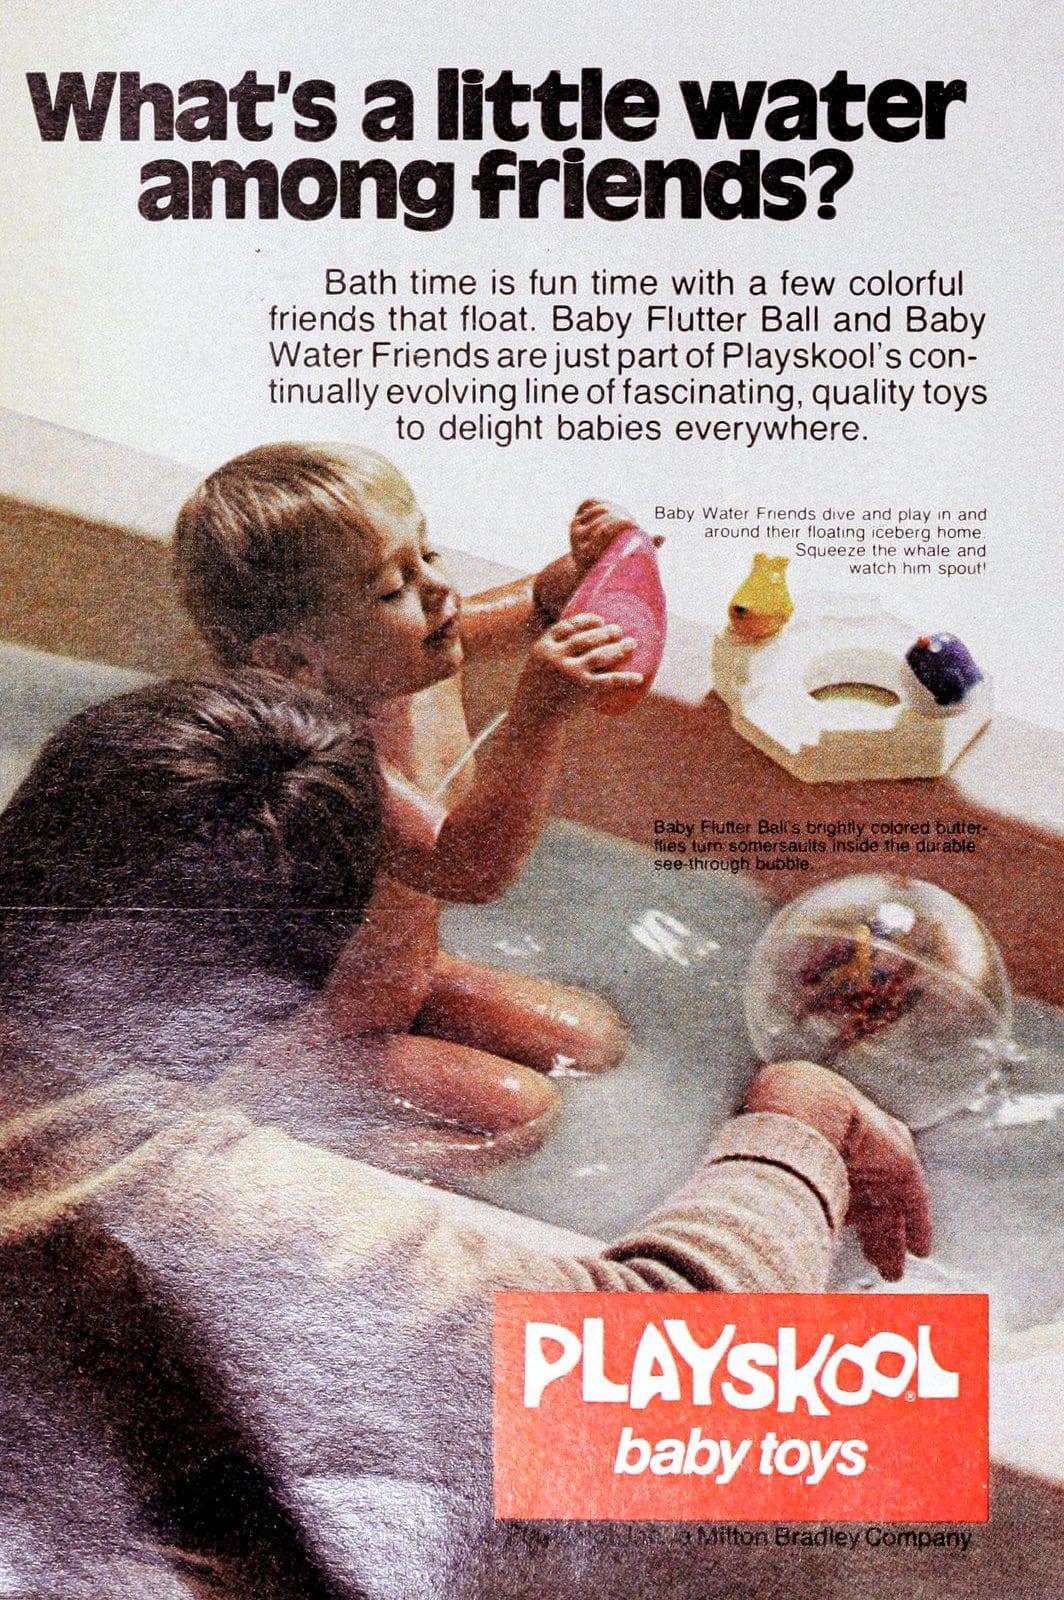 1970s Playskool baby bath toys (1978)